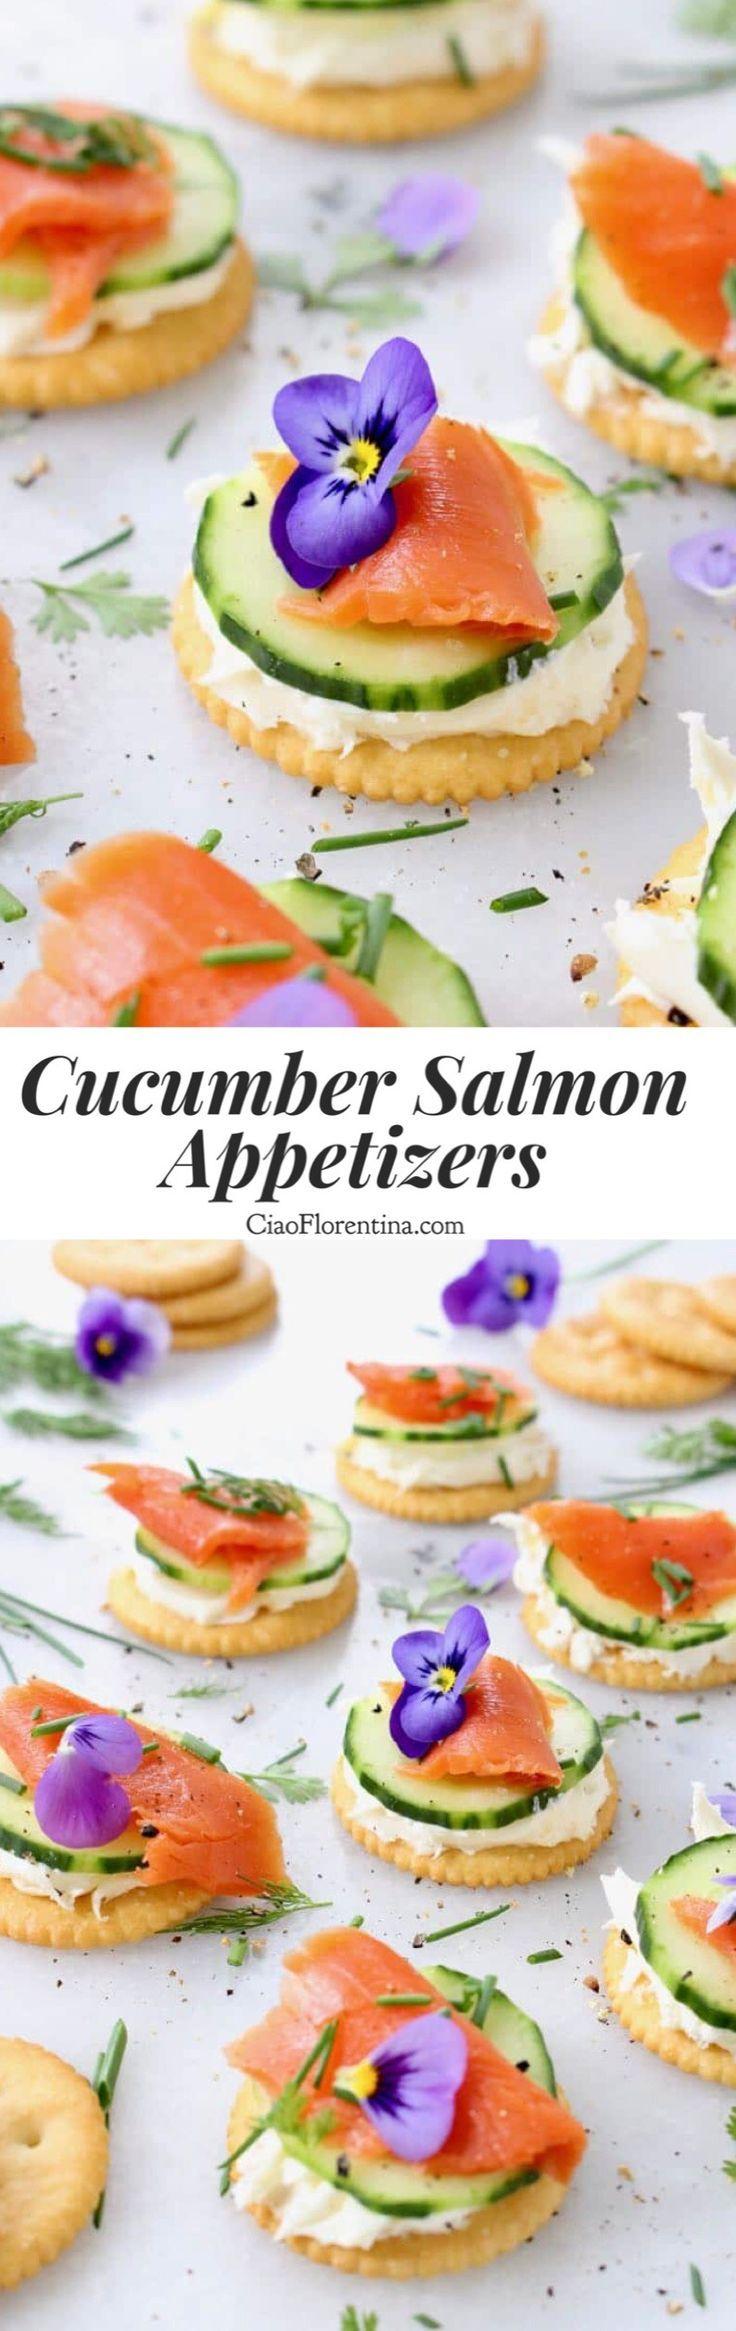 Cucumber Salmon Appetizers • CiaoFlorentina